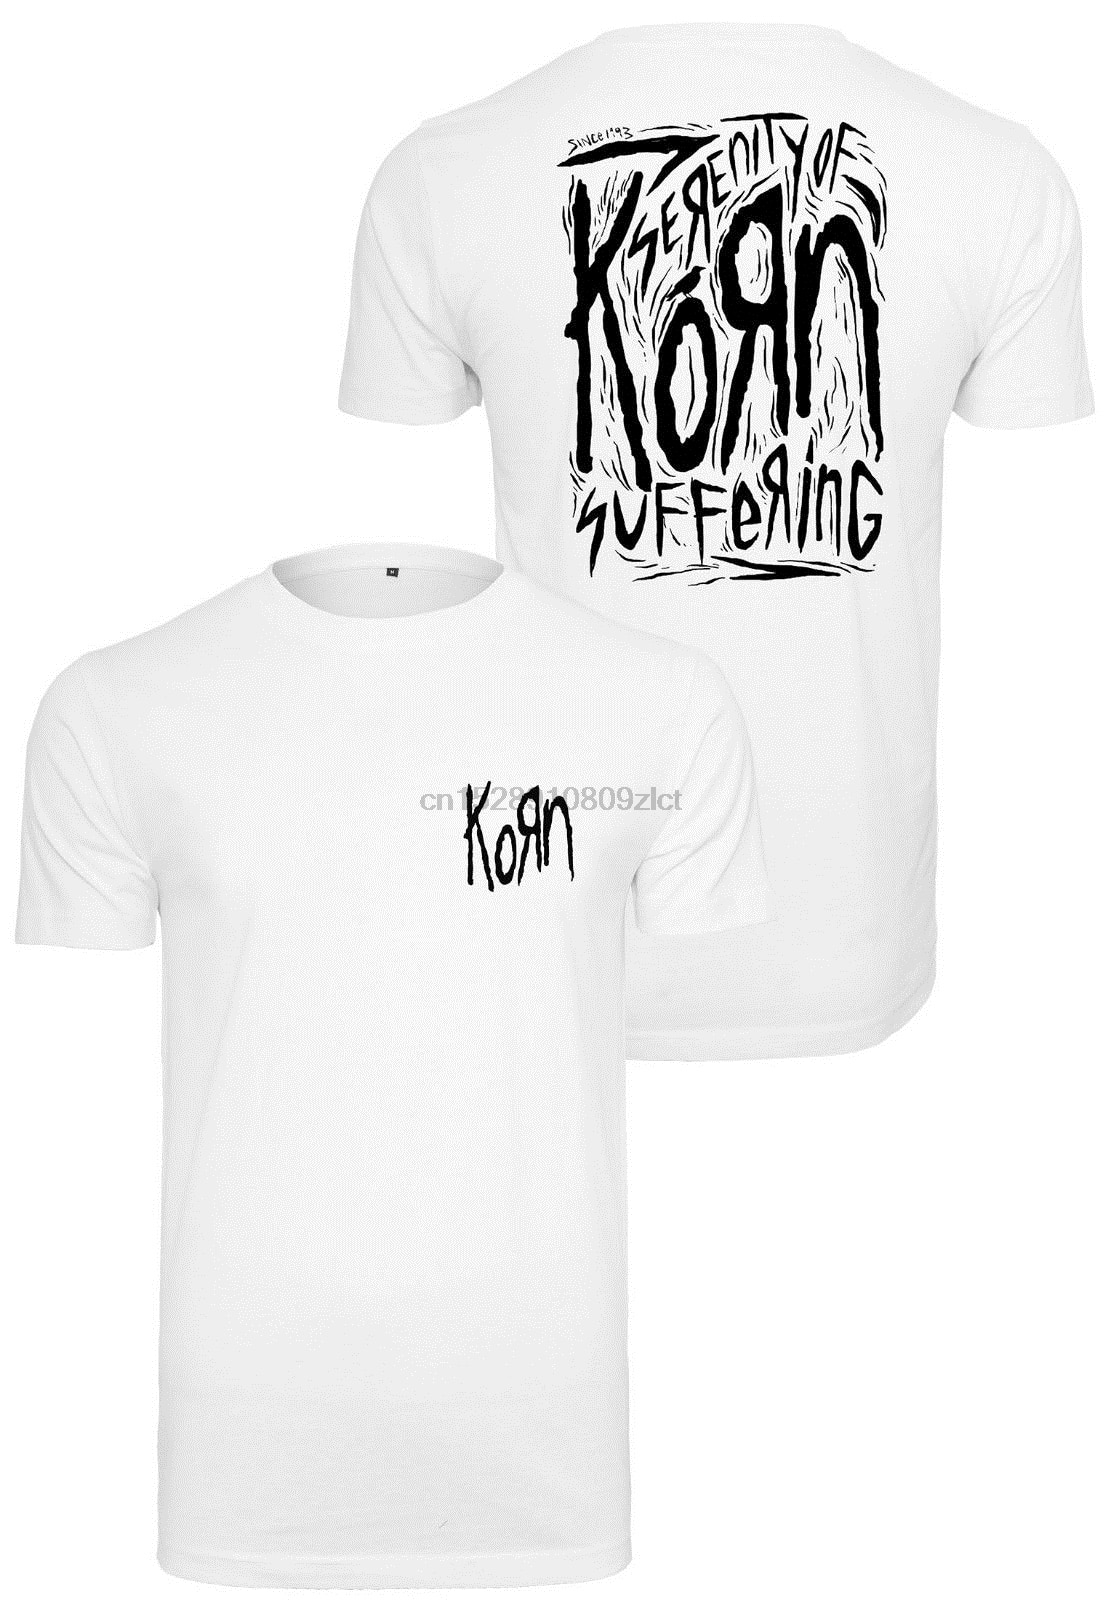 MERCHCODE Джерси мужская футболка с коротким рукавом Korn Suffering Tee